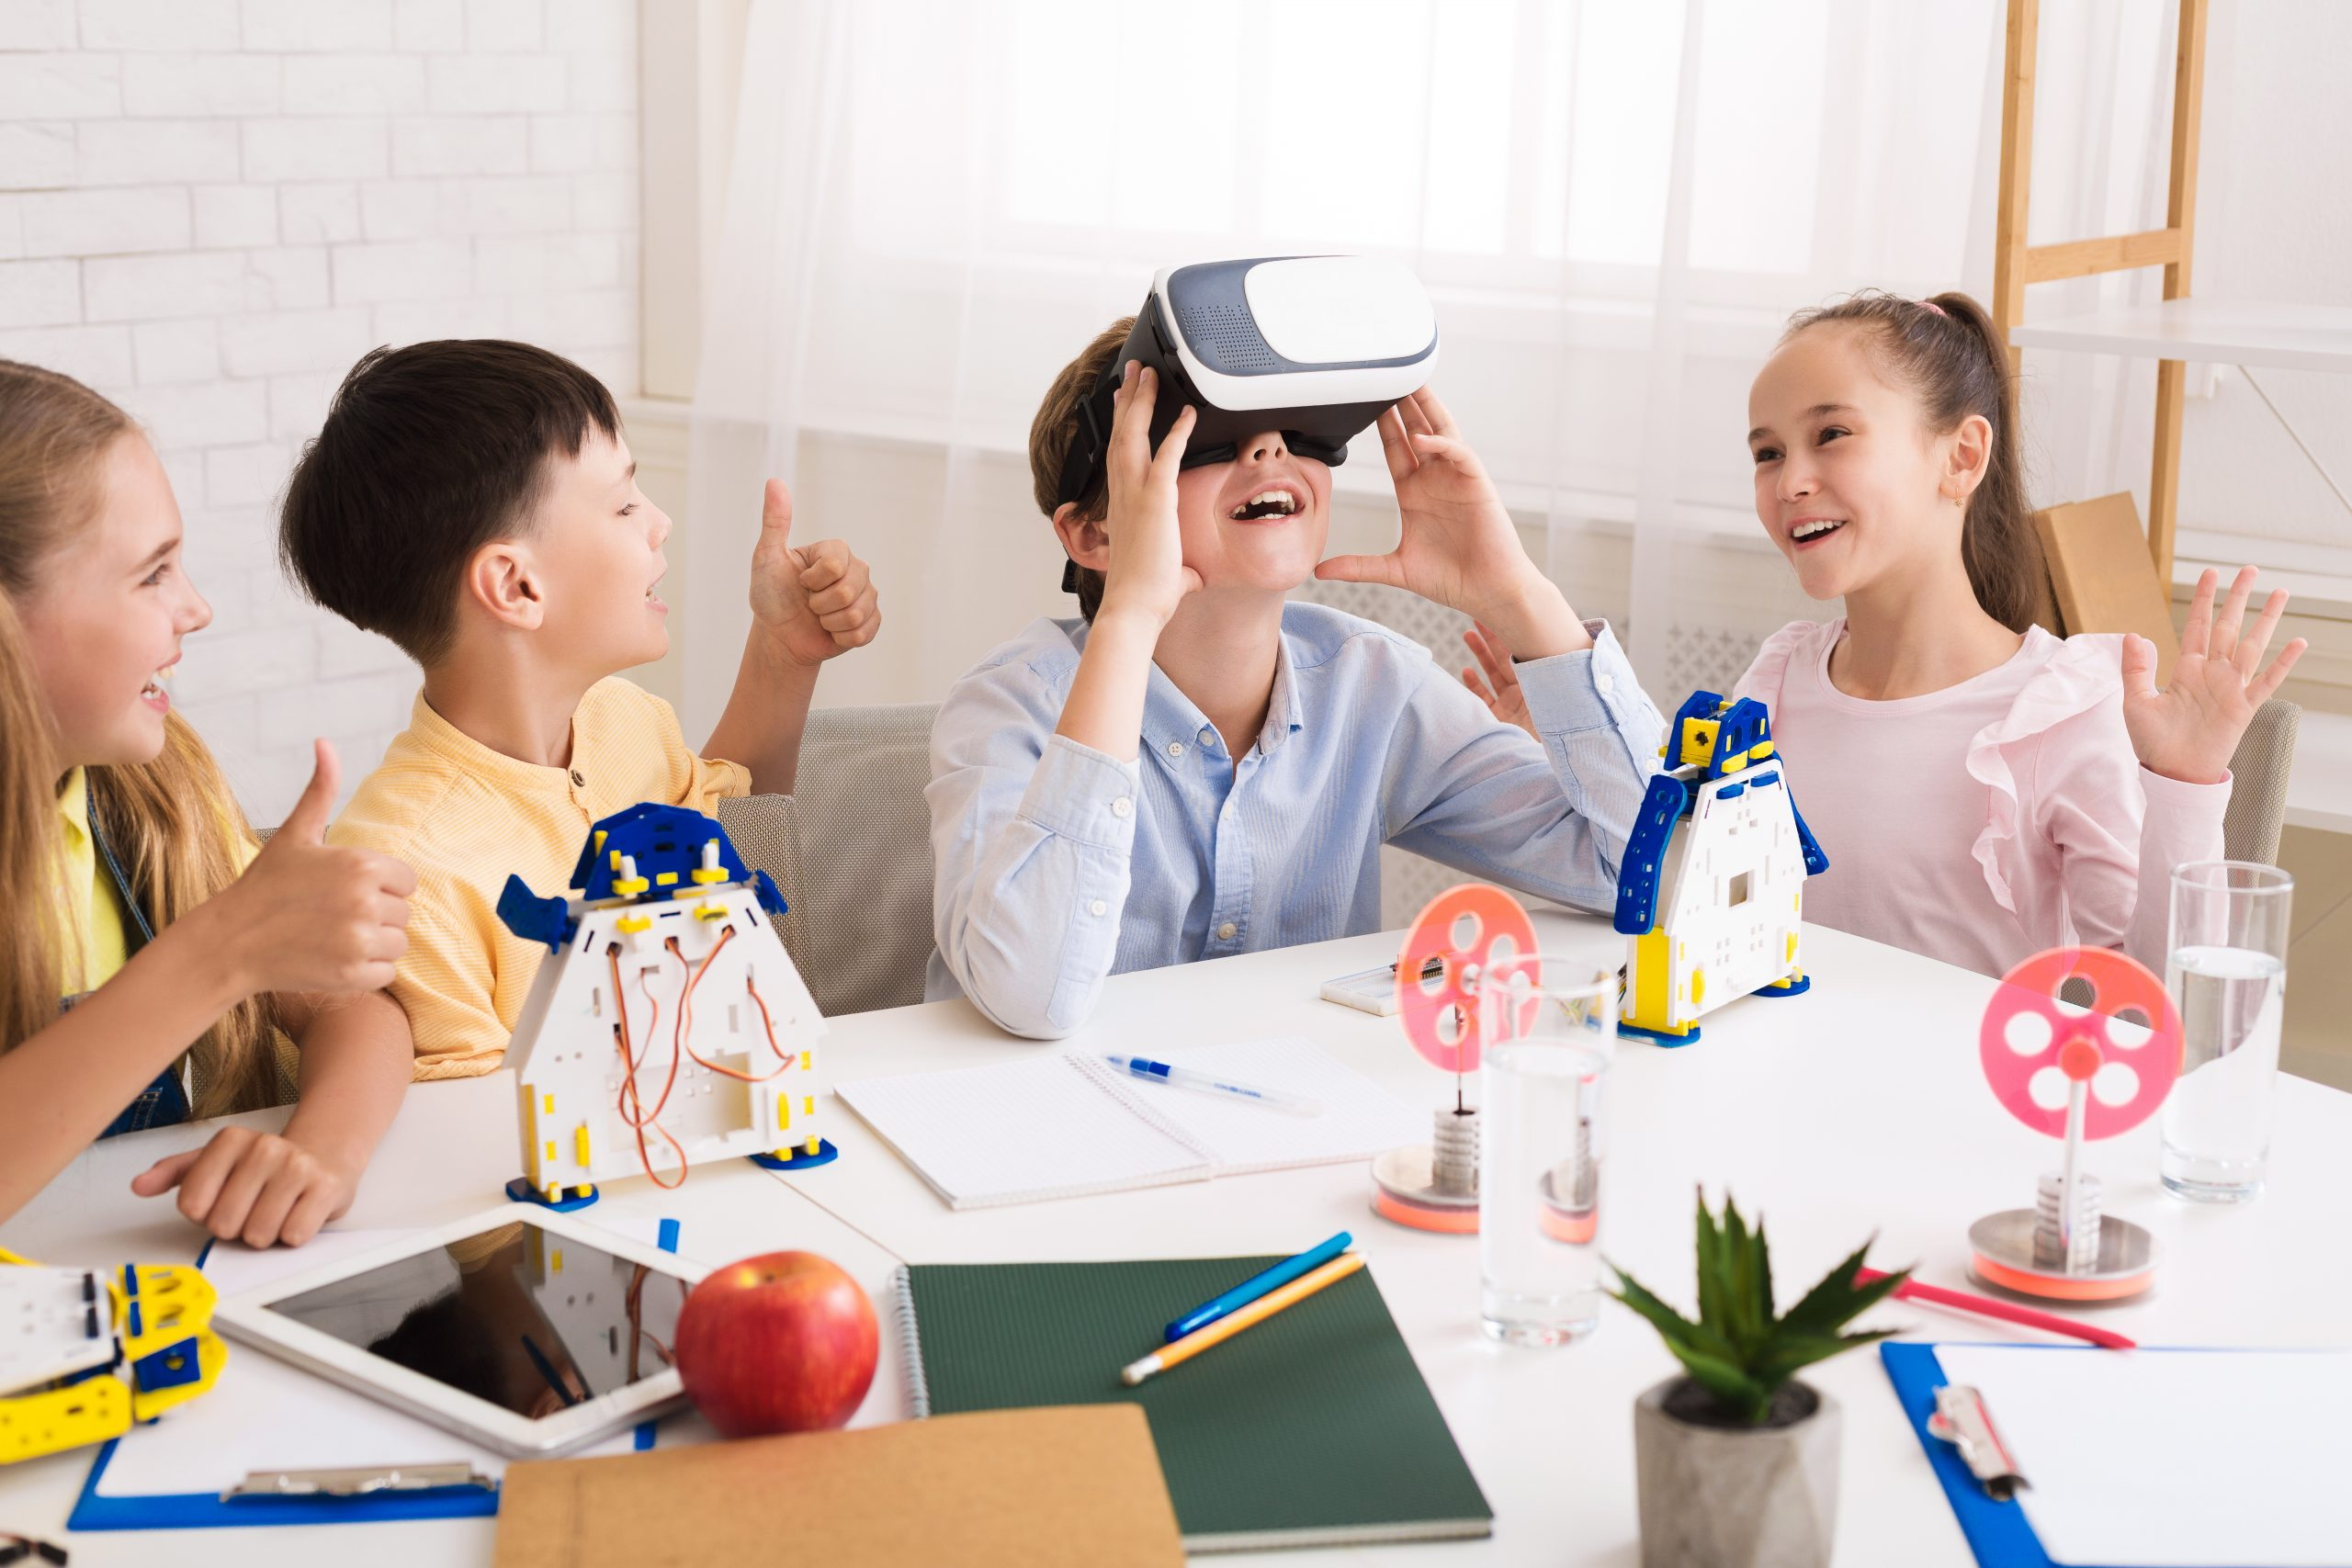 Reform Party - Modernizing Education for Future Success